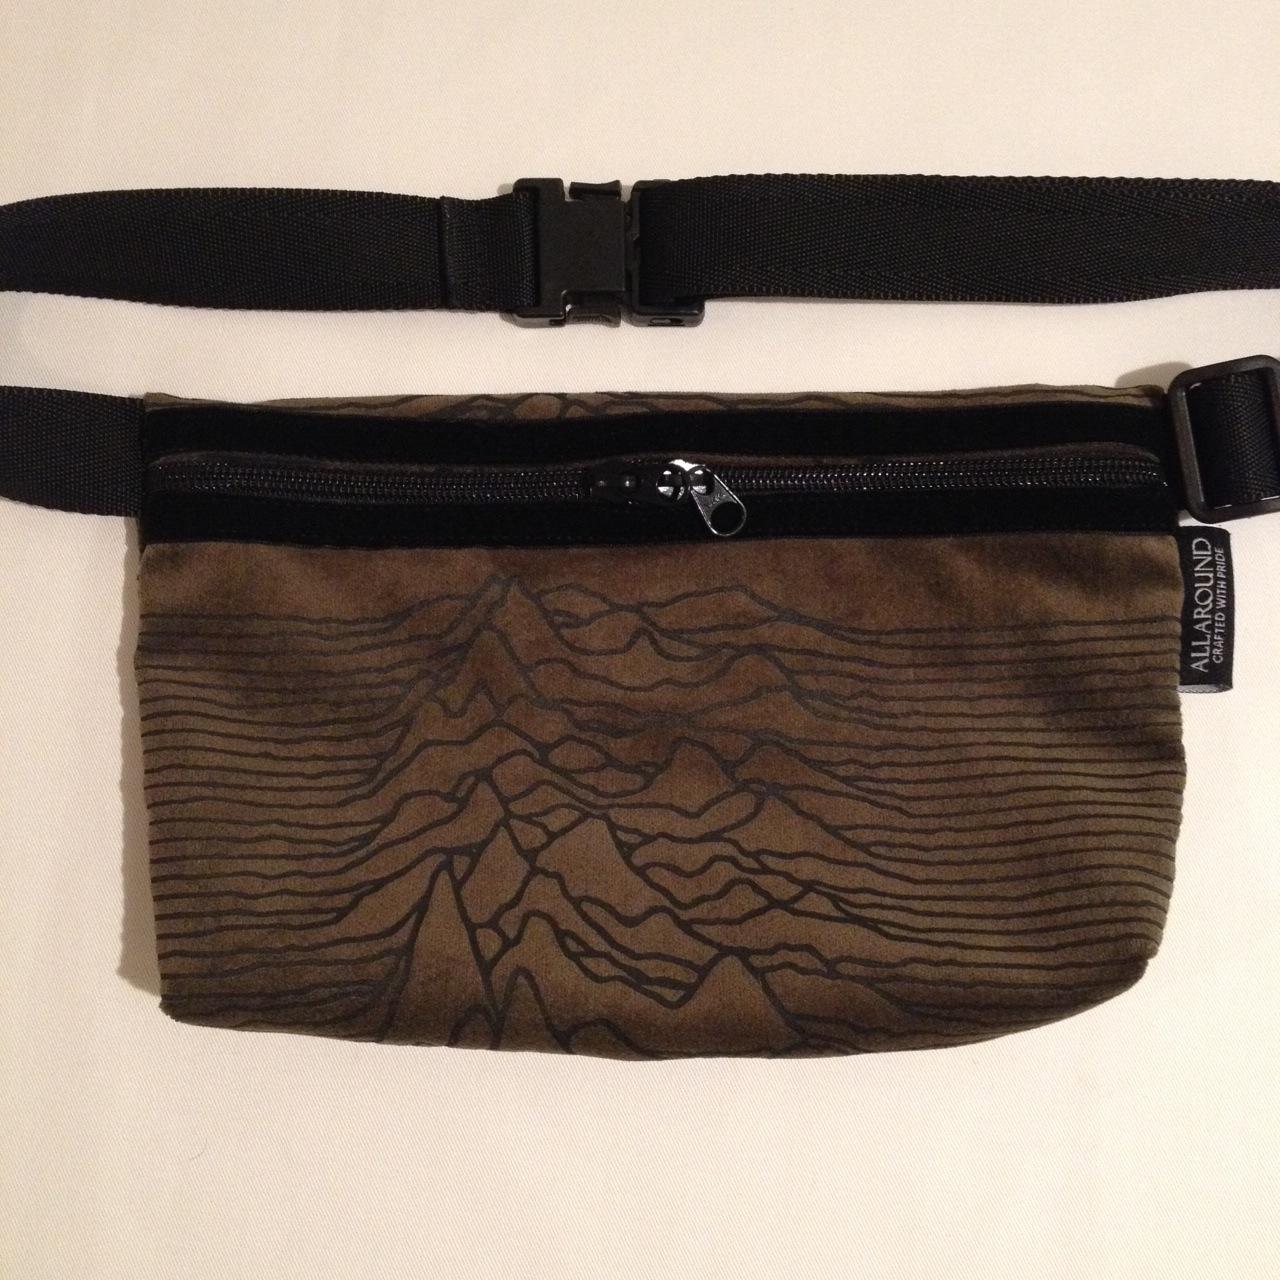 Rala x ALLAROUND COLLABORATION (Fac-10 mini waist pouch)_c0127070_1917430.jpg